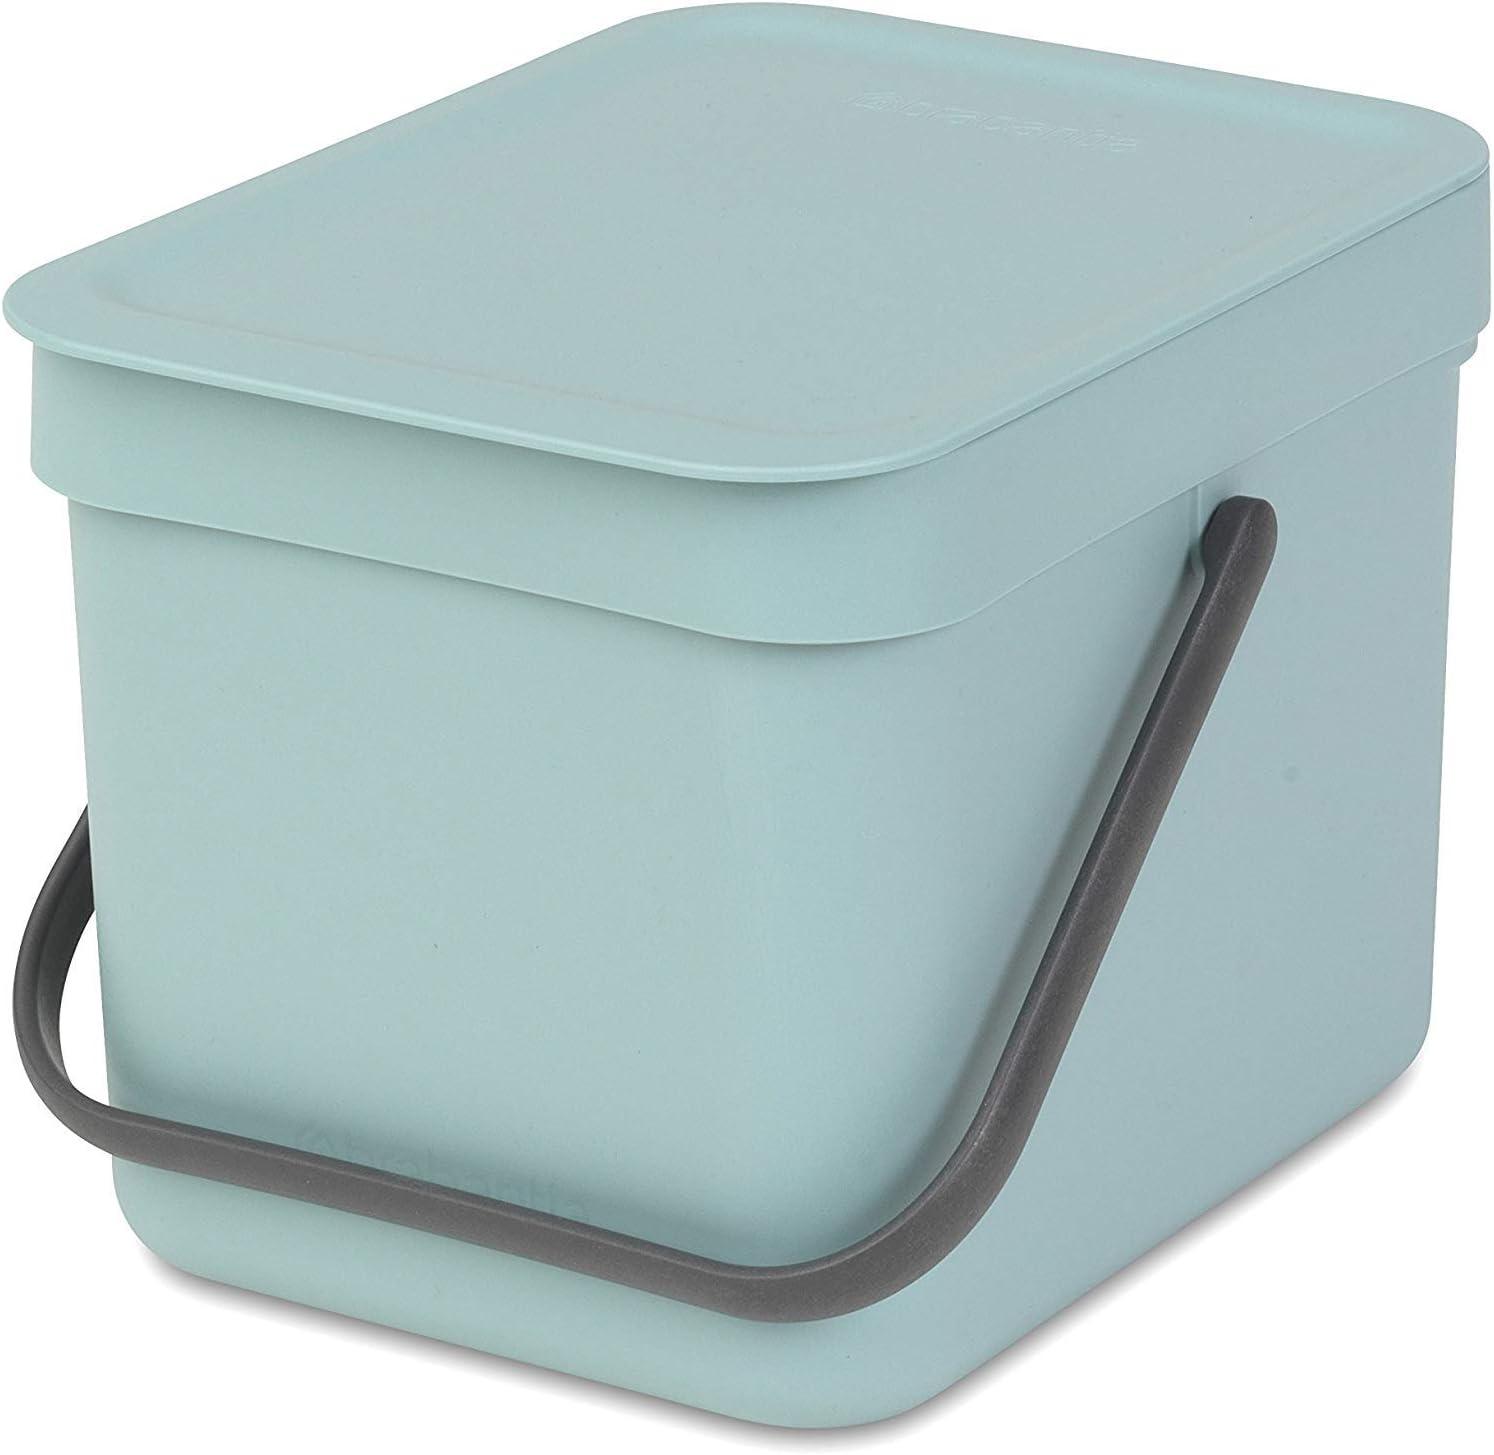 Brabantia Sort and Go Food Waste Caddy, Plastic, 6 L - Mint Green